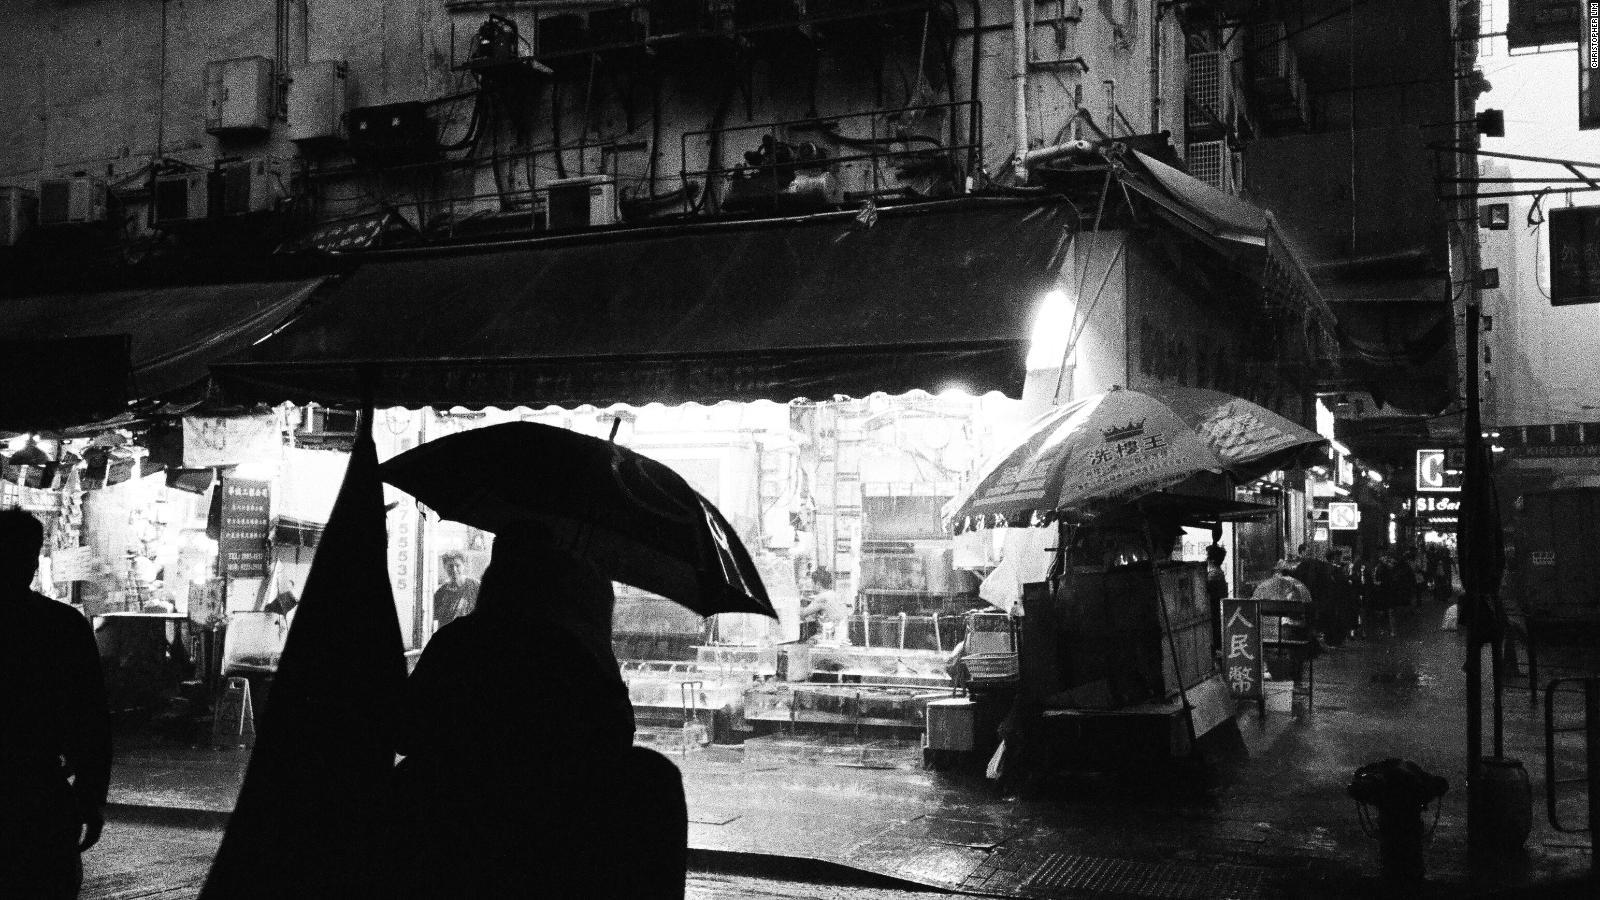 Hong Kong Street Photography Get Tips From A Pro Cnn Travel